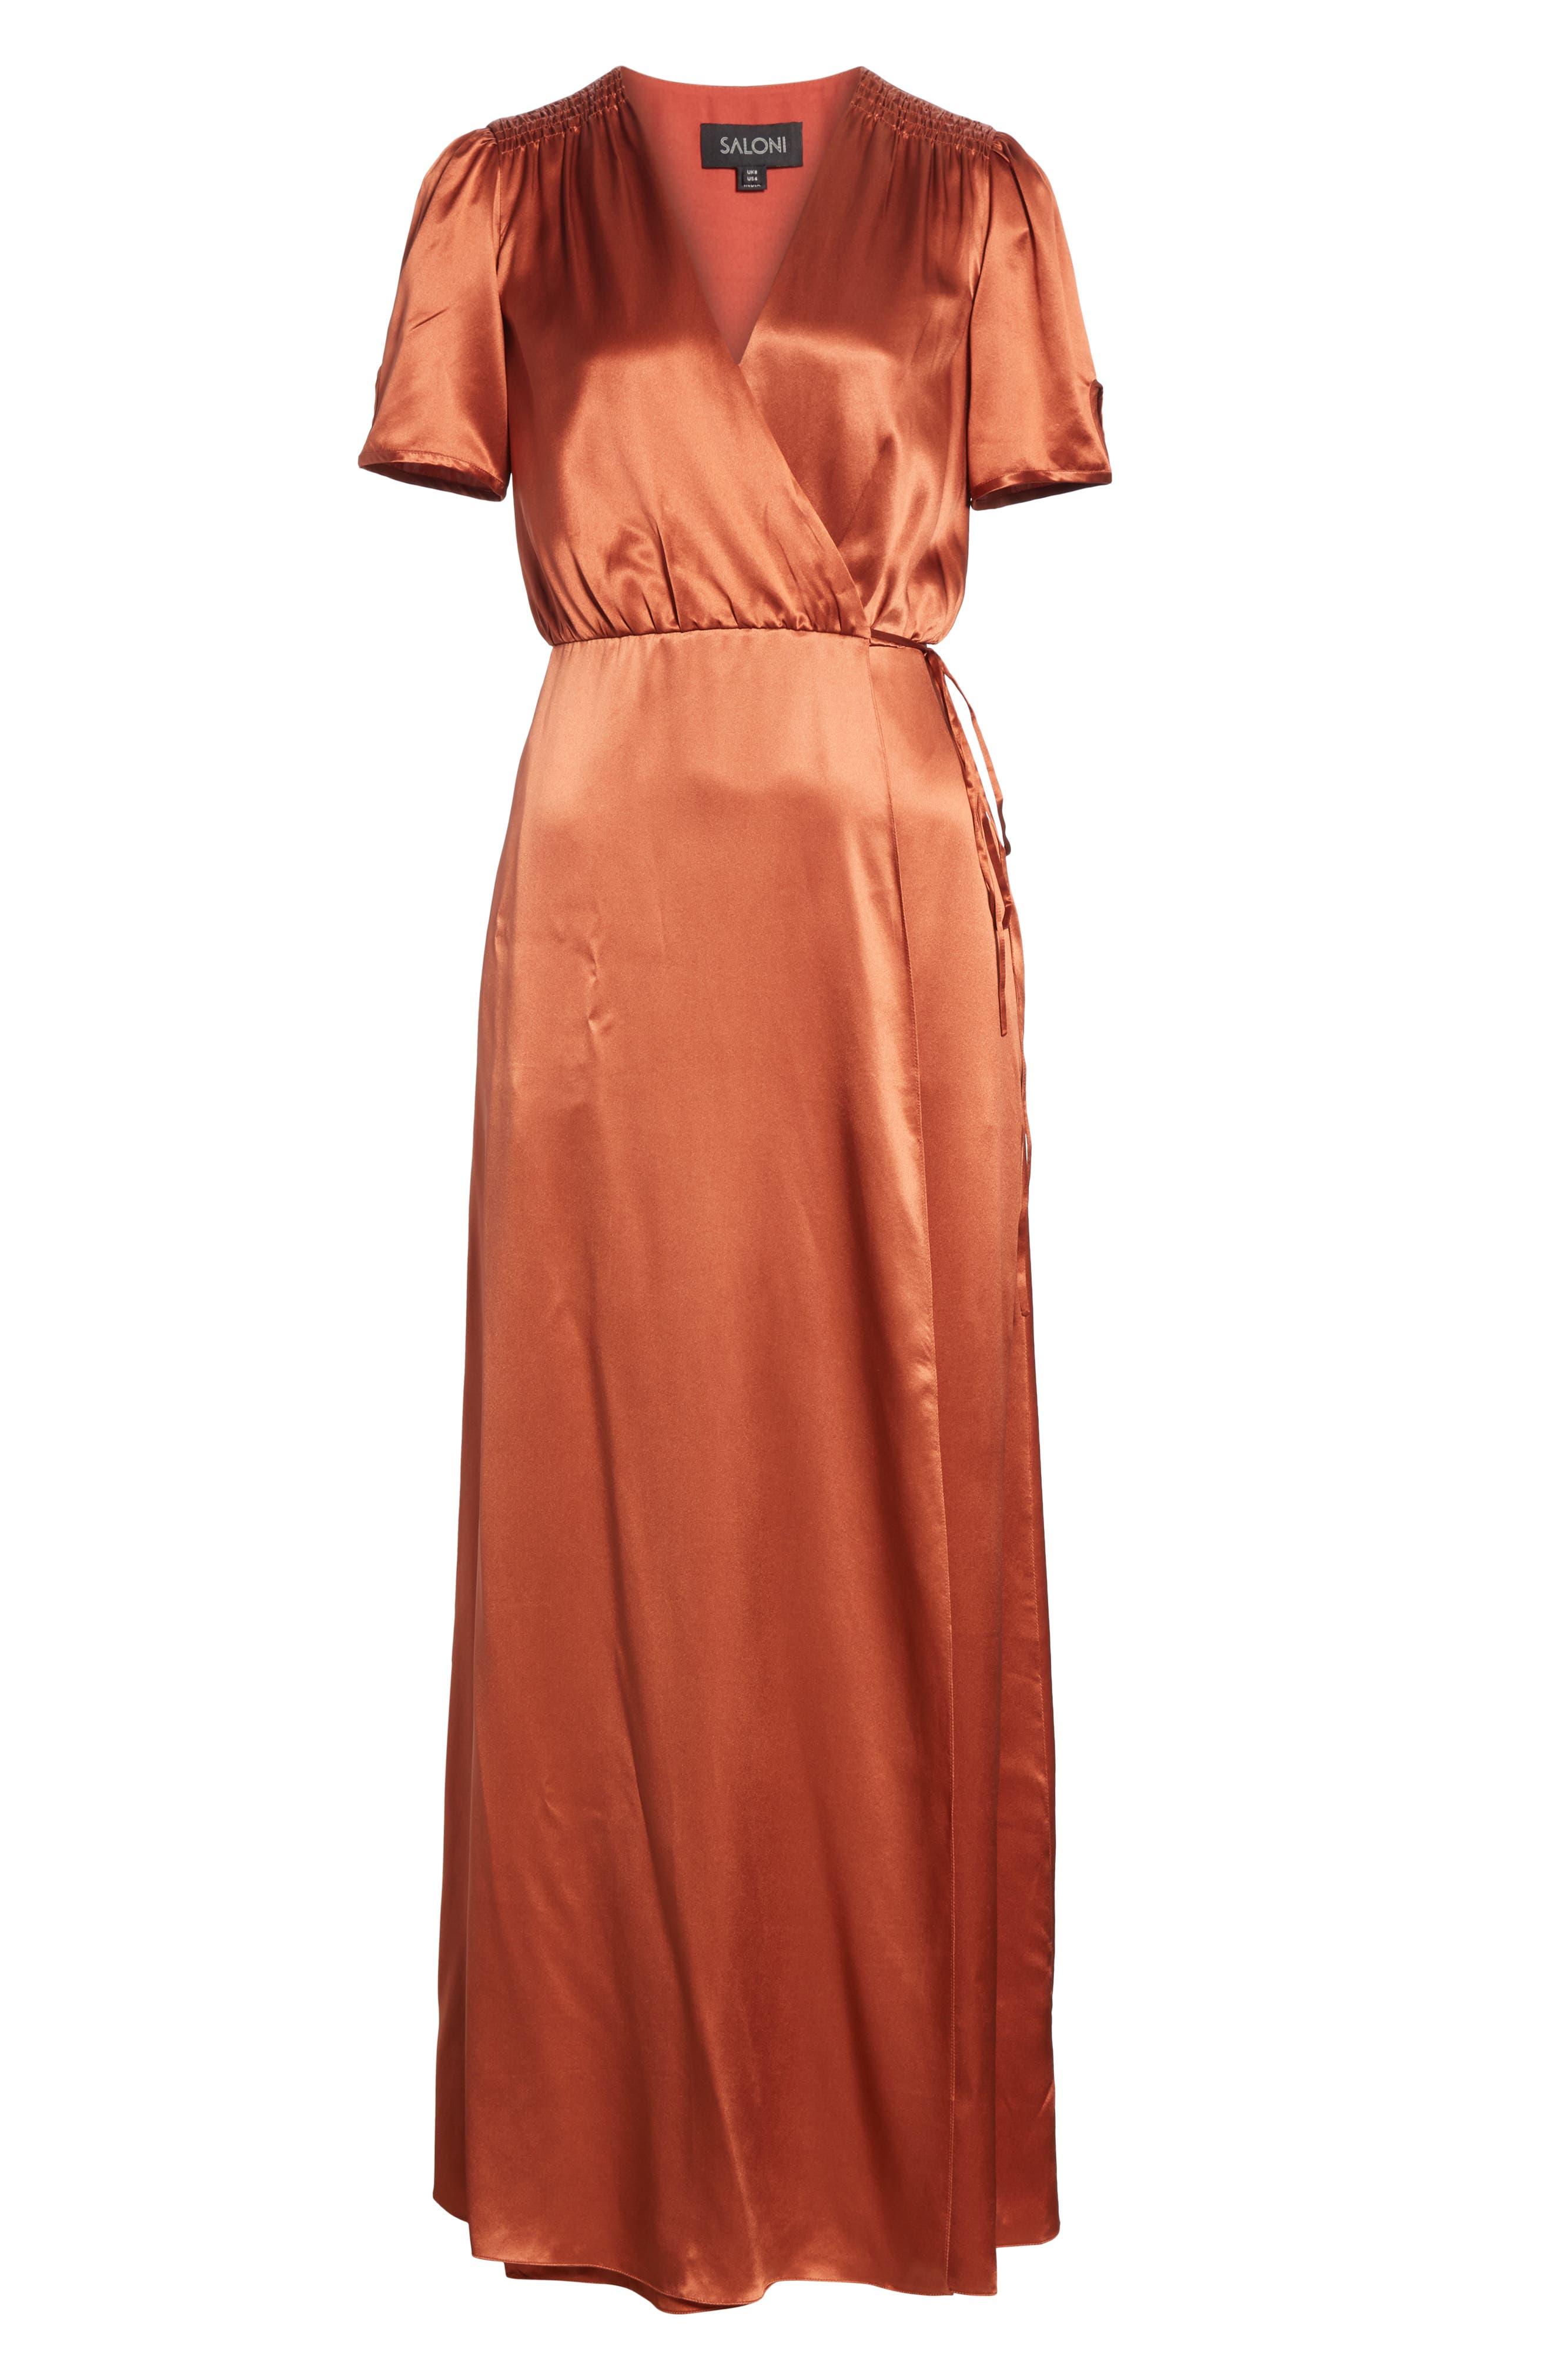 SALONI, Lea Silk Wrap Dress, Alternate thumbnail 6, color, DEEP RUSH